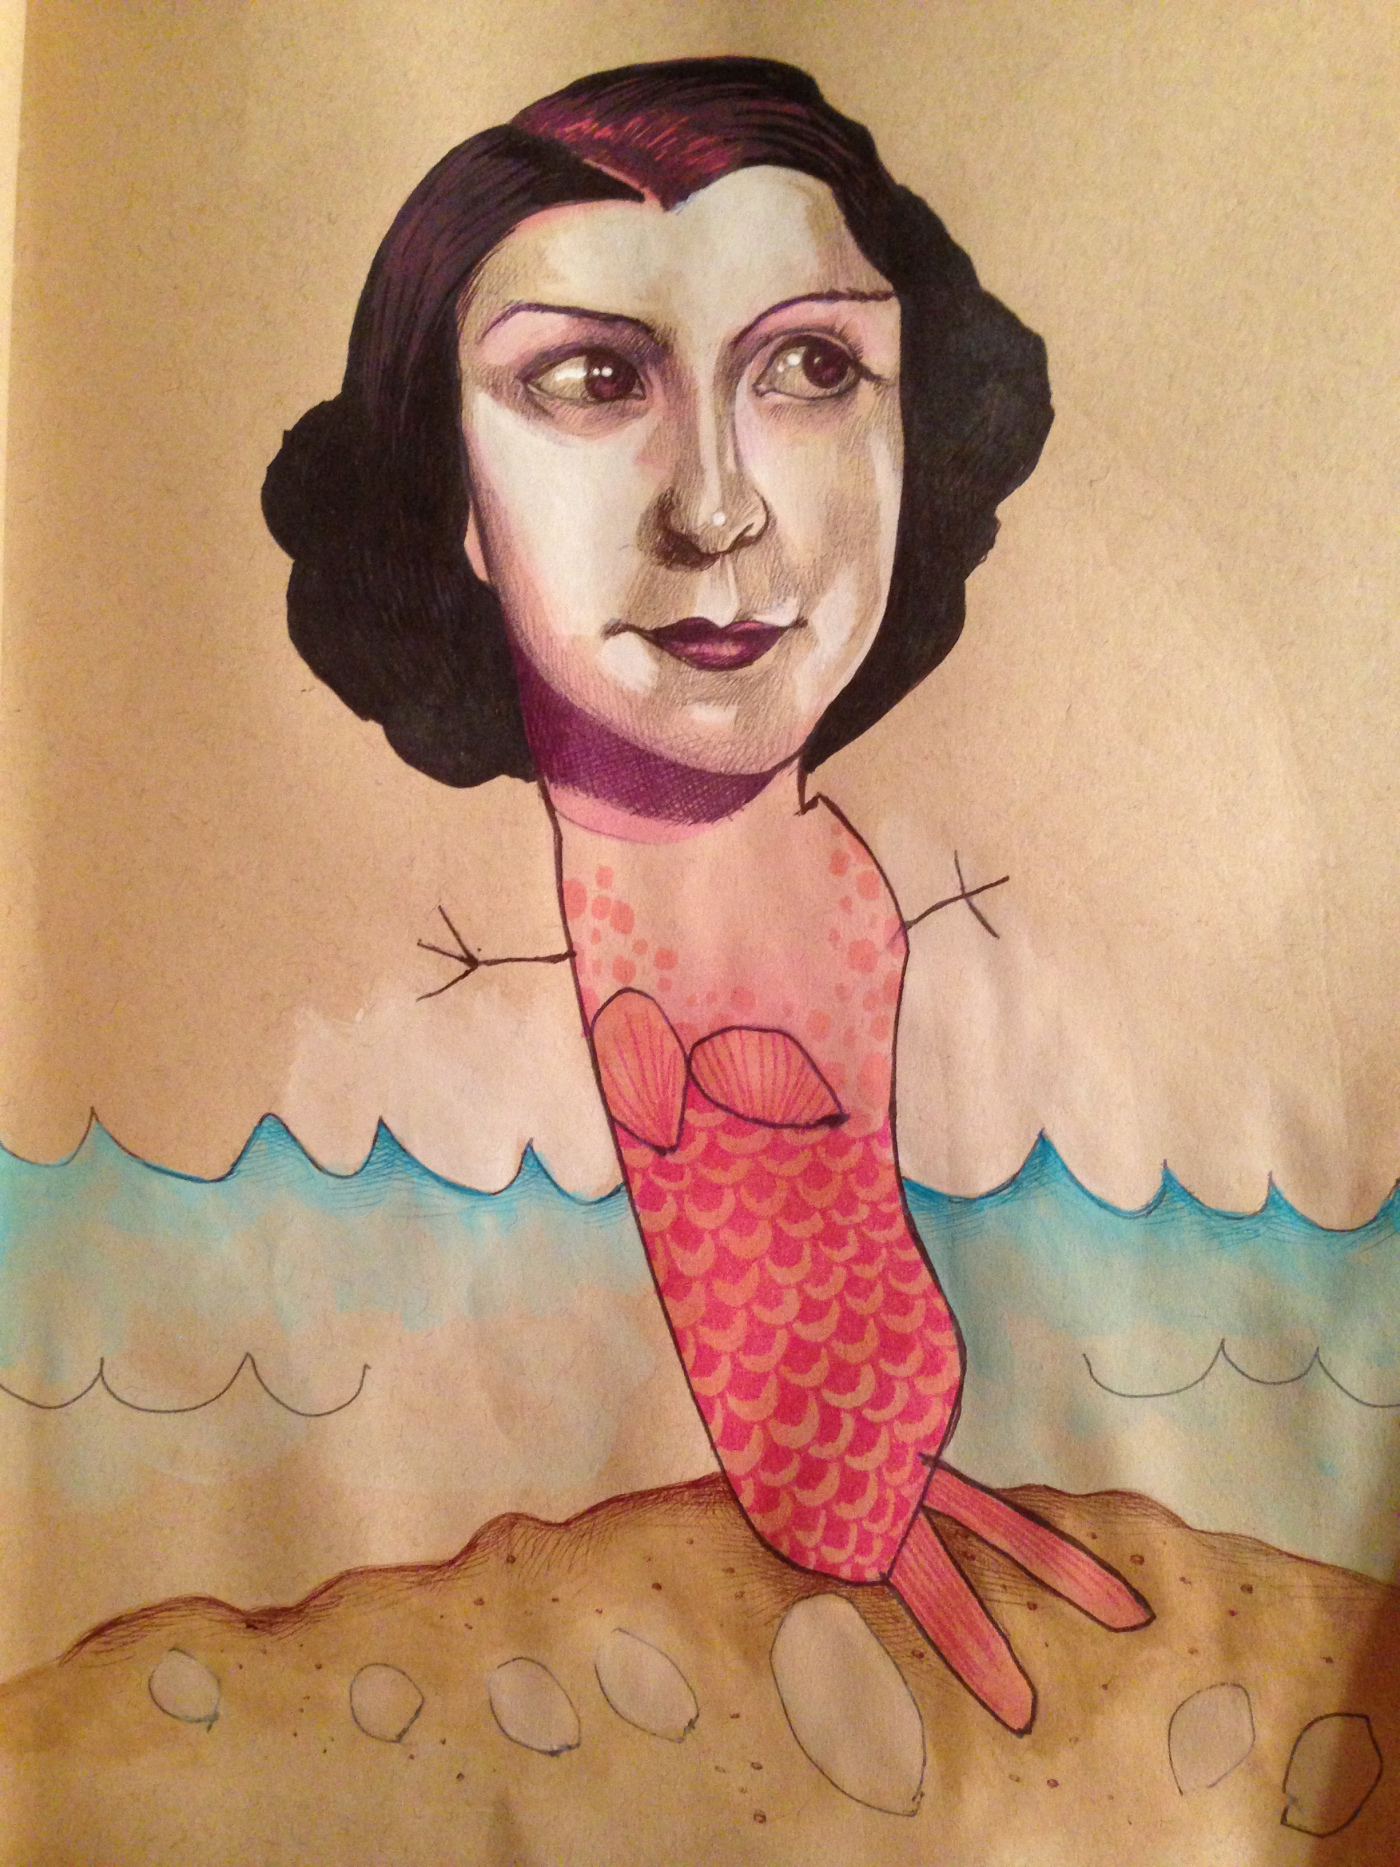 Иллюстрации от Мики Анджелы Хендрикс и её дочери